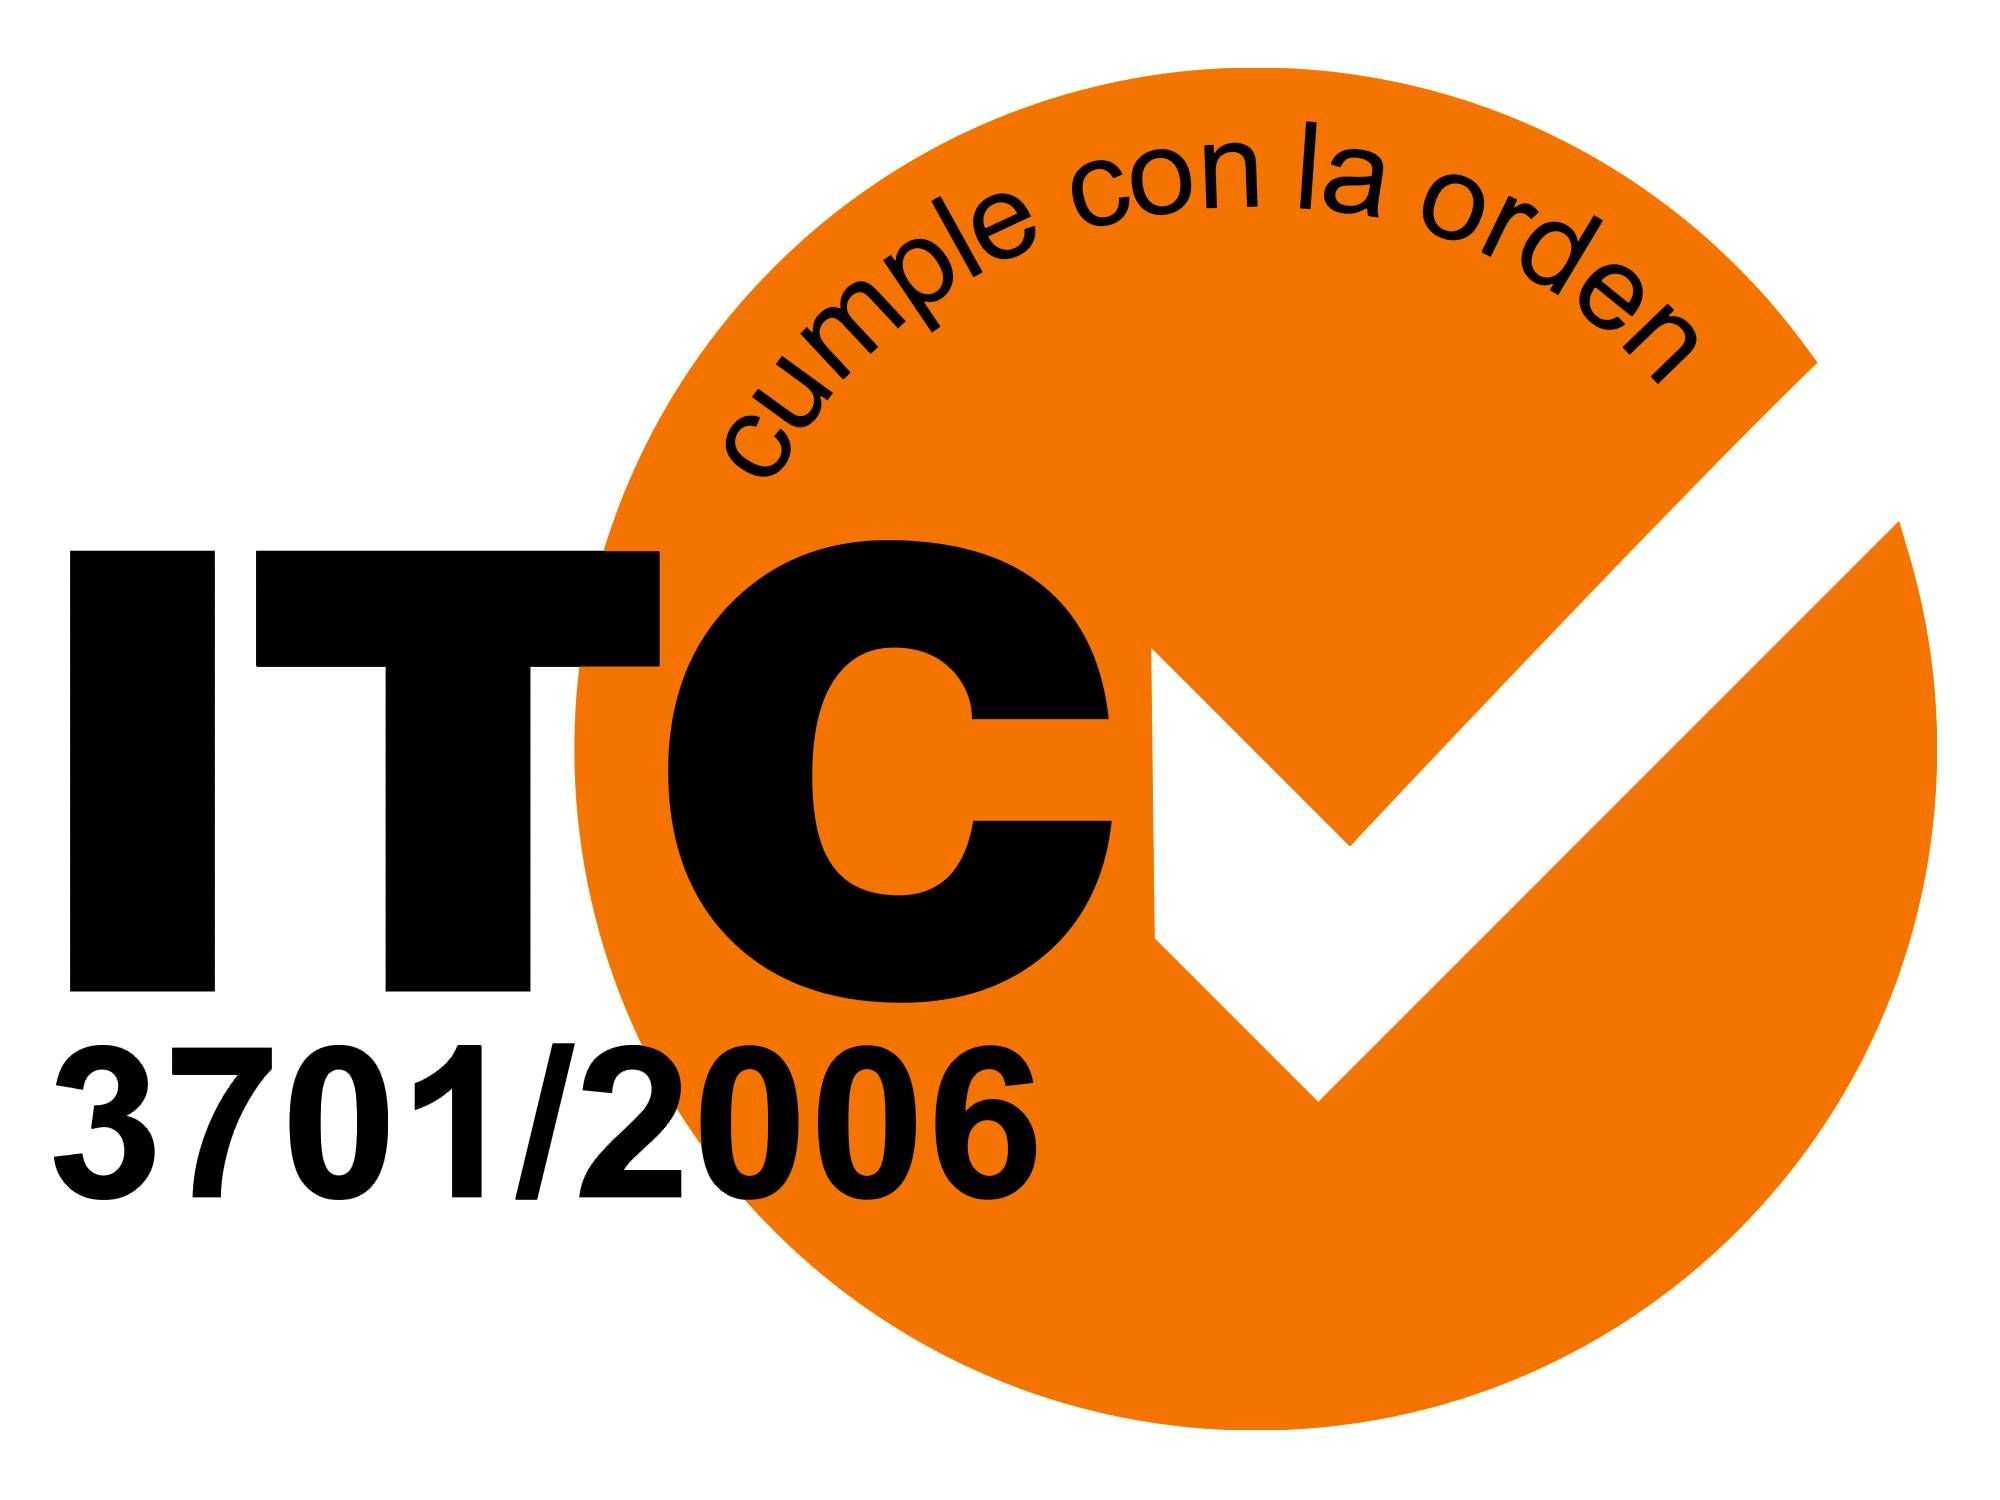 Imag-testo-ITC-Logo-Sello-326dpi.png